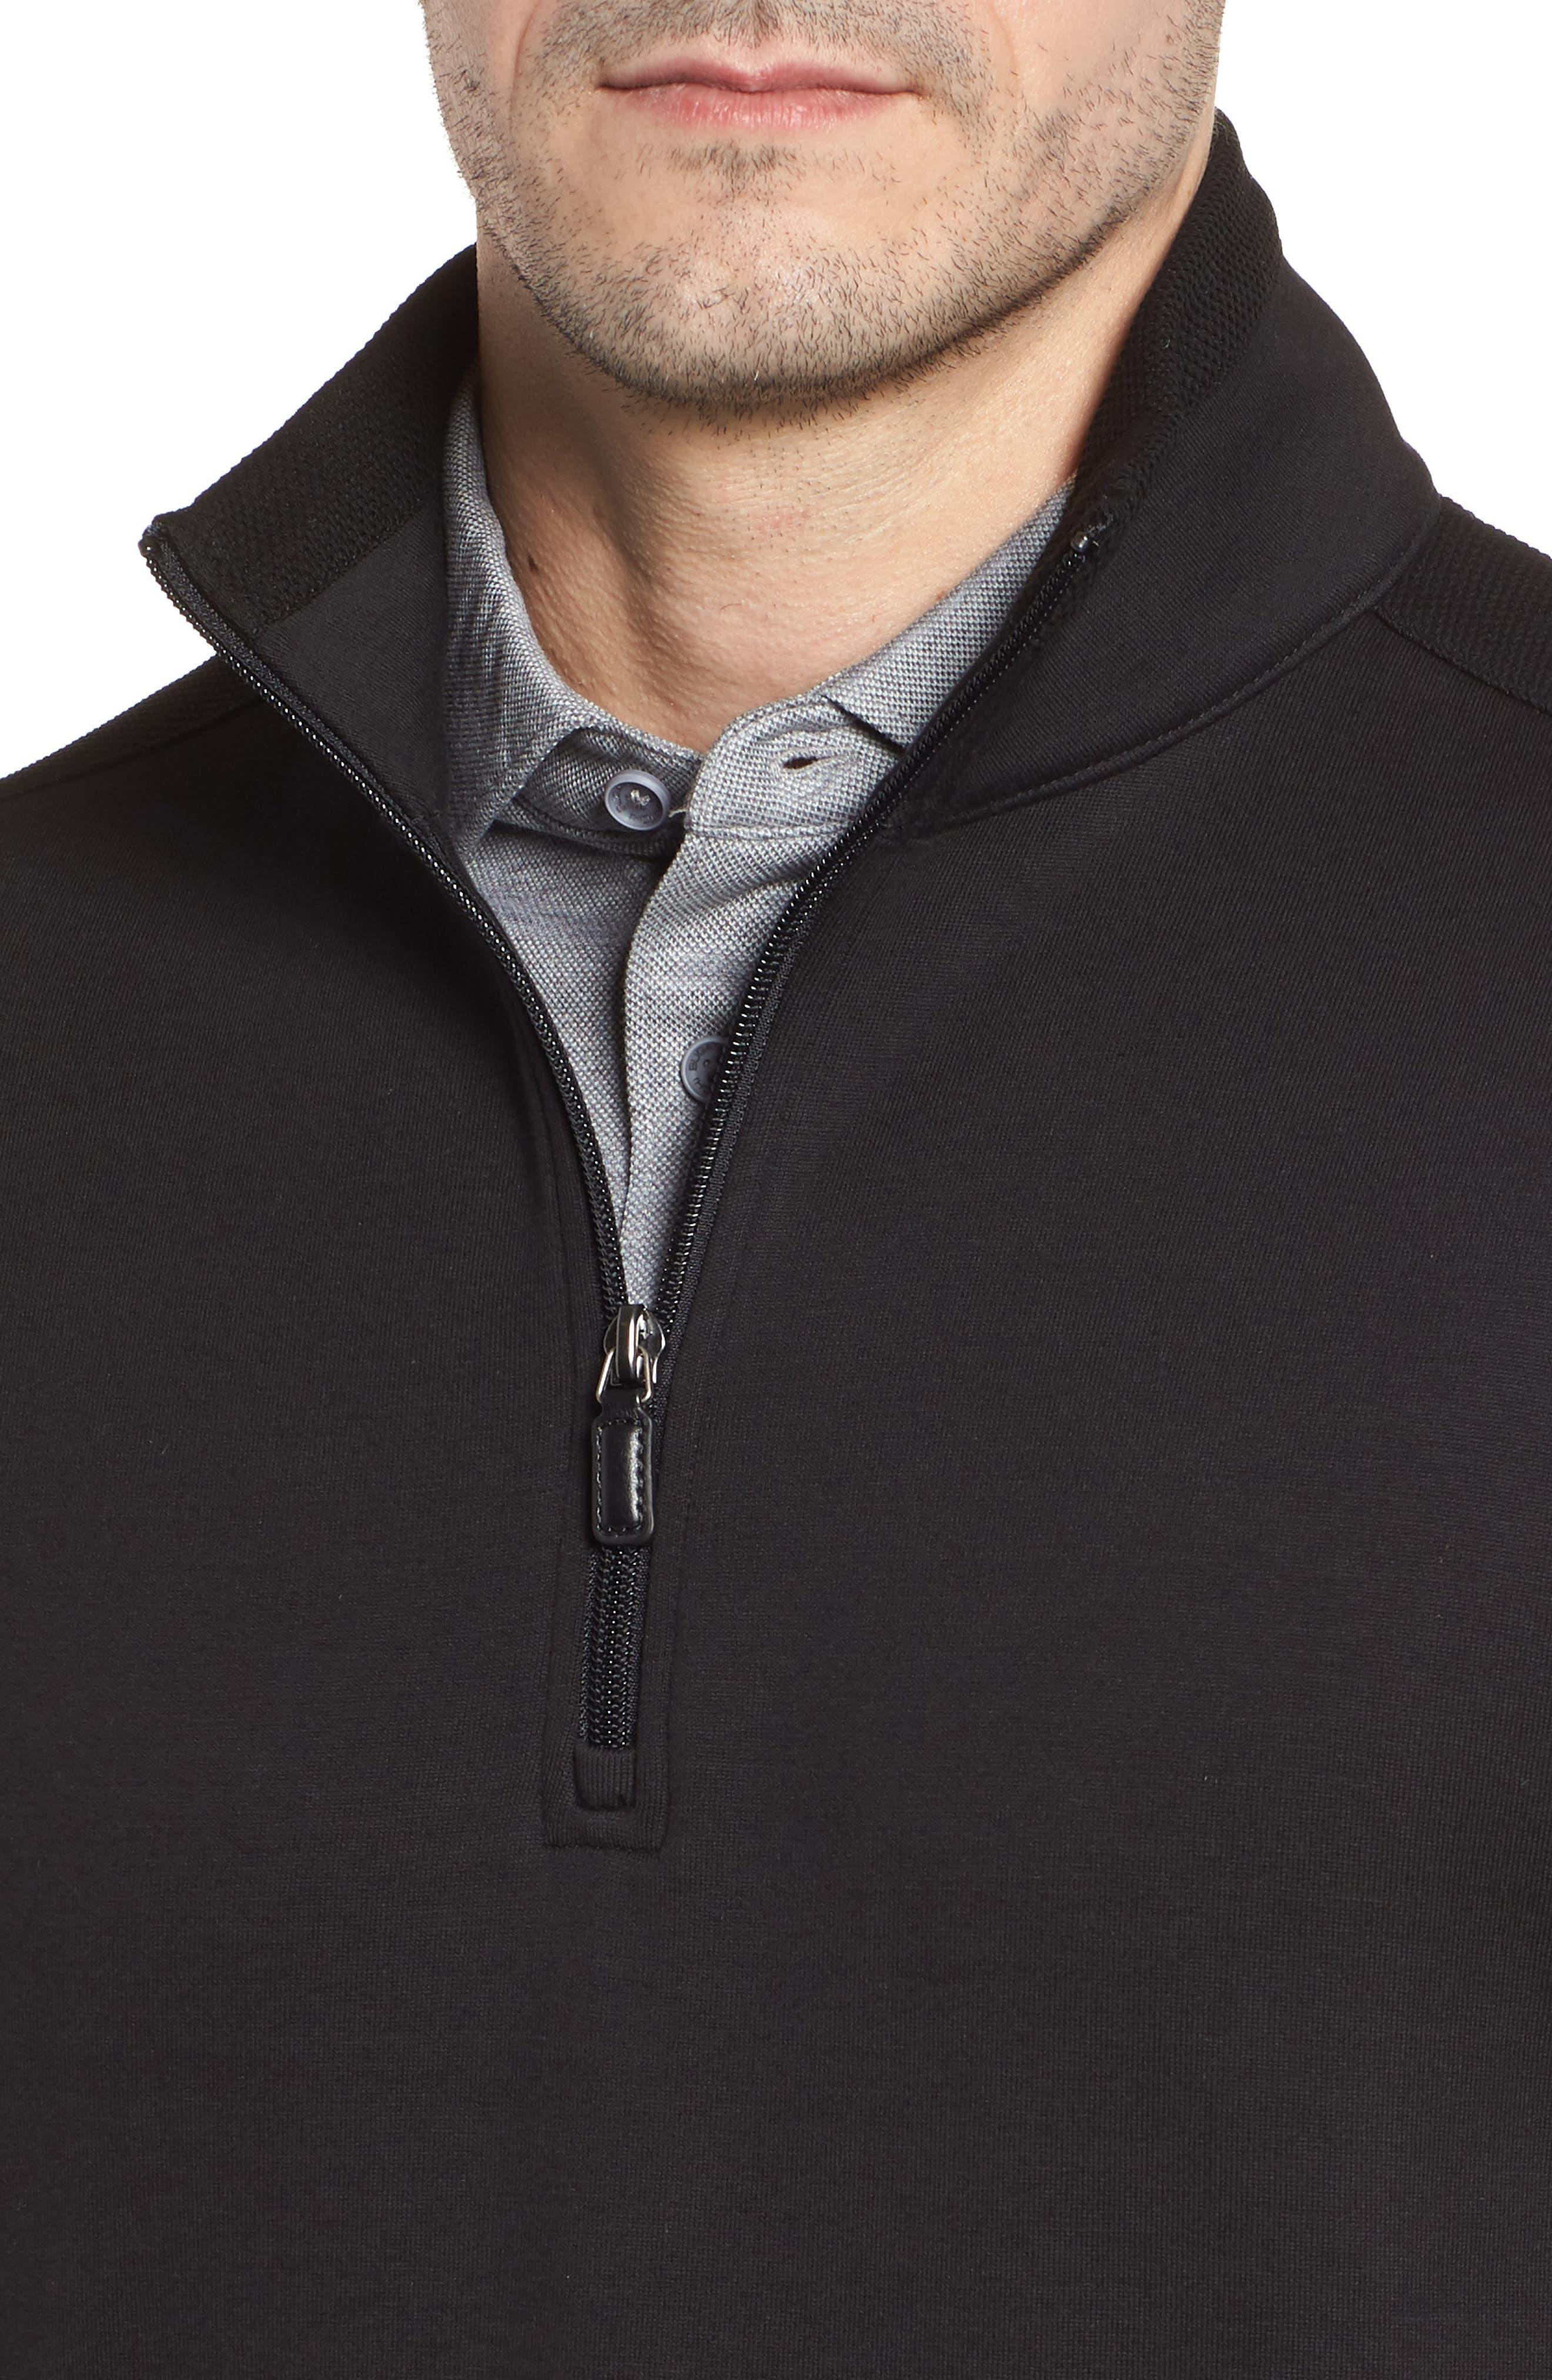 Regular Fit Knit Quarter Zip Pullover,                             Alternate thumbnail 4, color,                             001